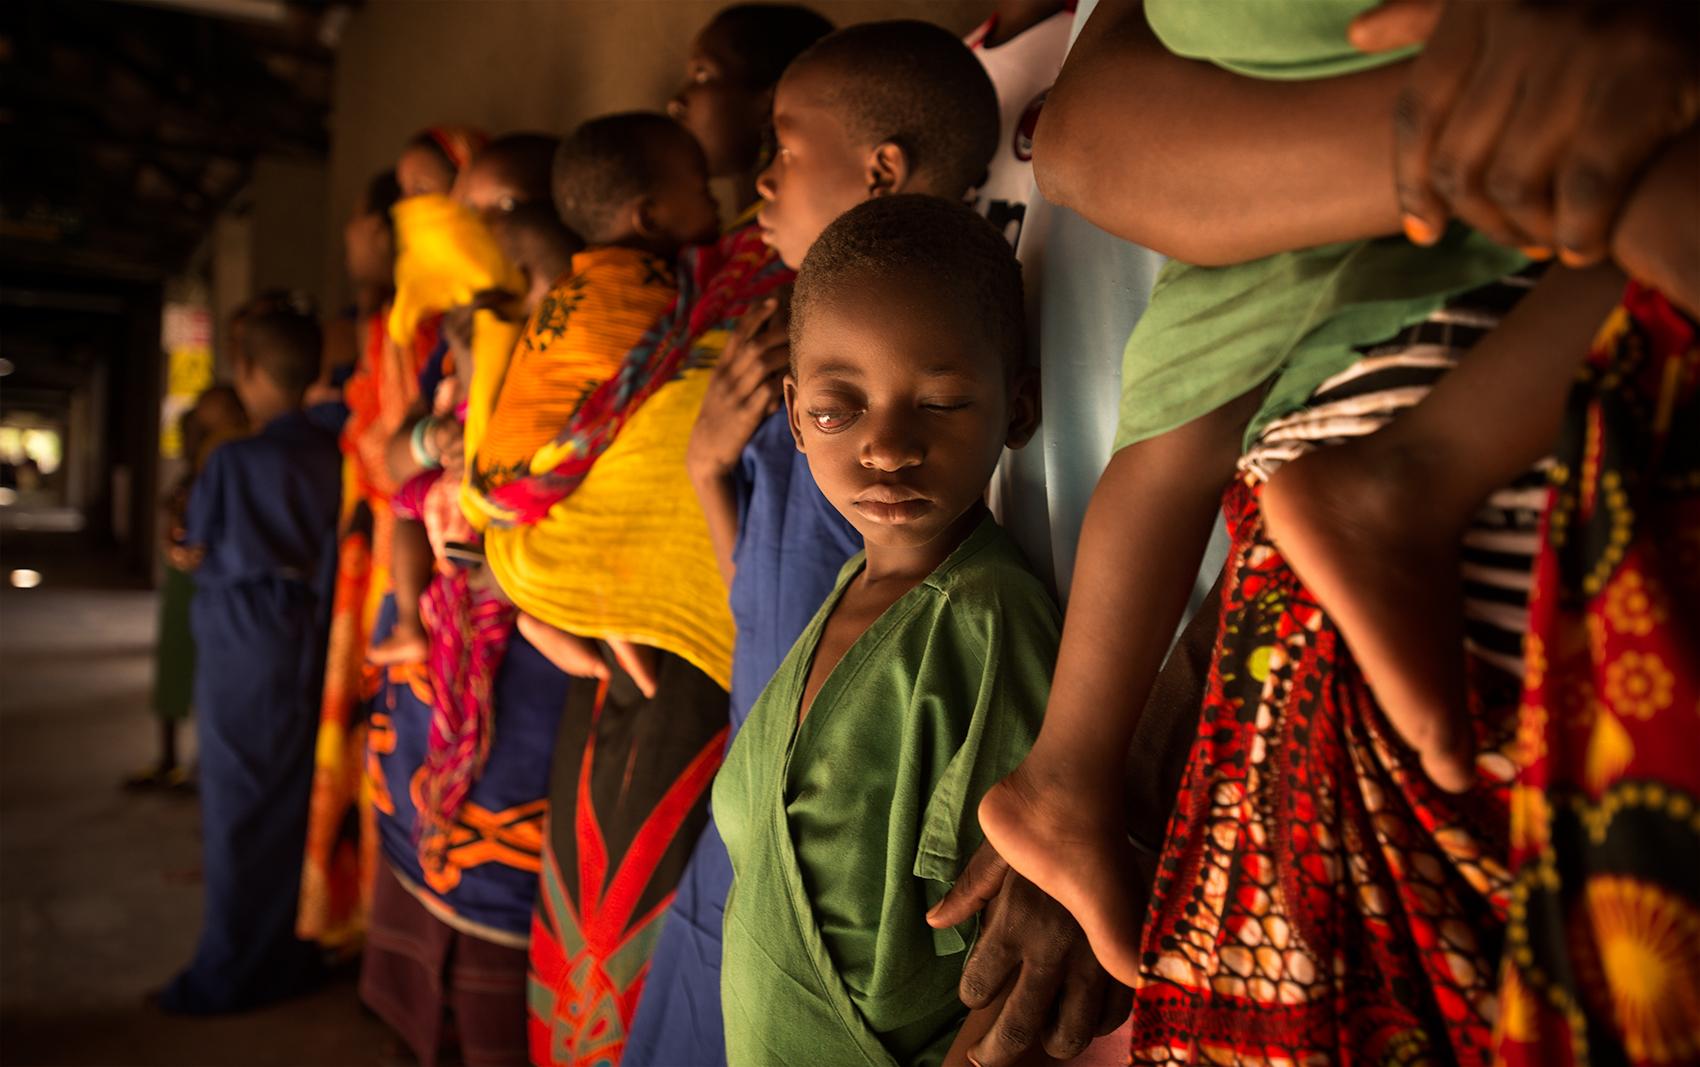 Blind children waiting for surgery, Dar Es Salaam, Tanzania